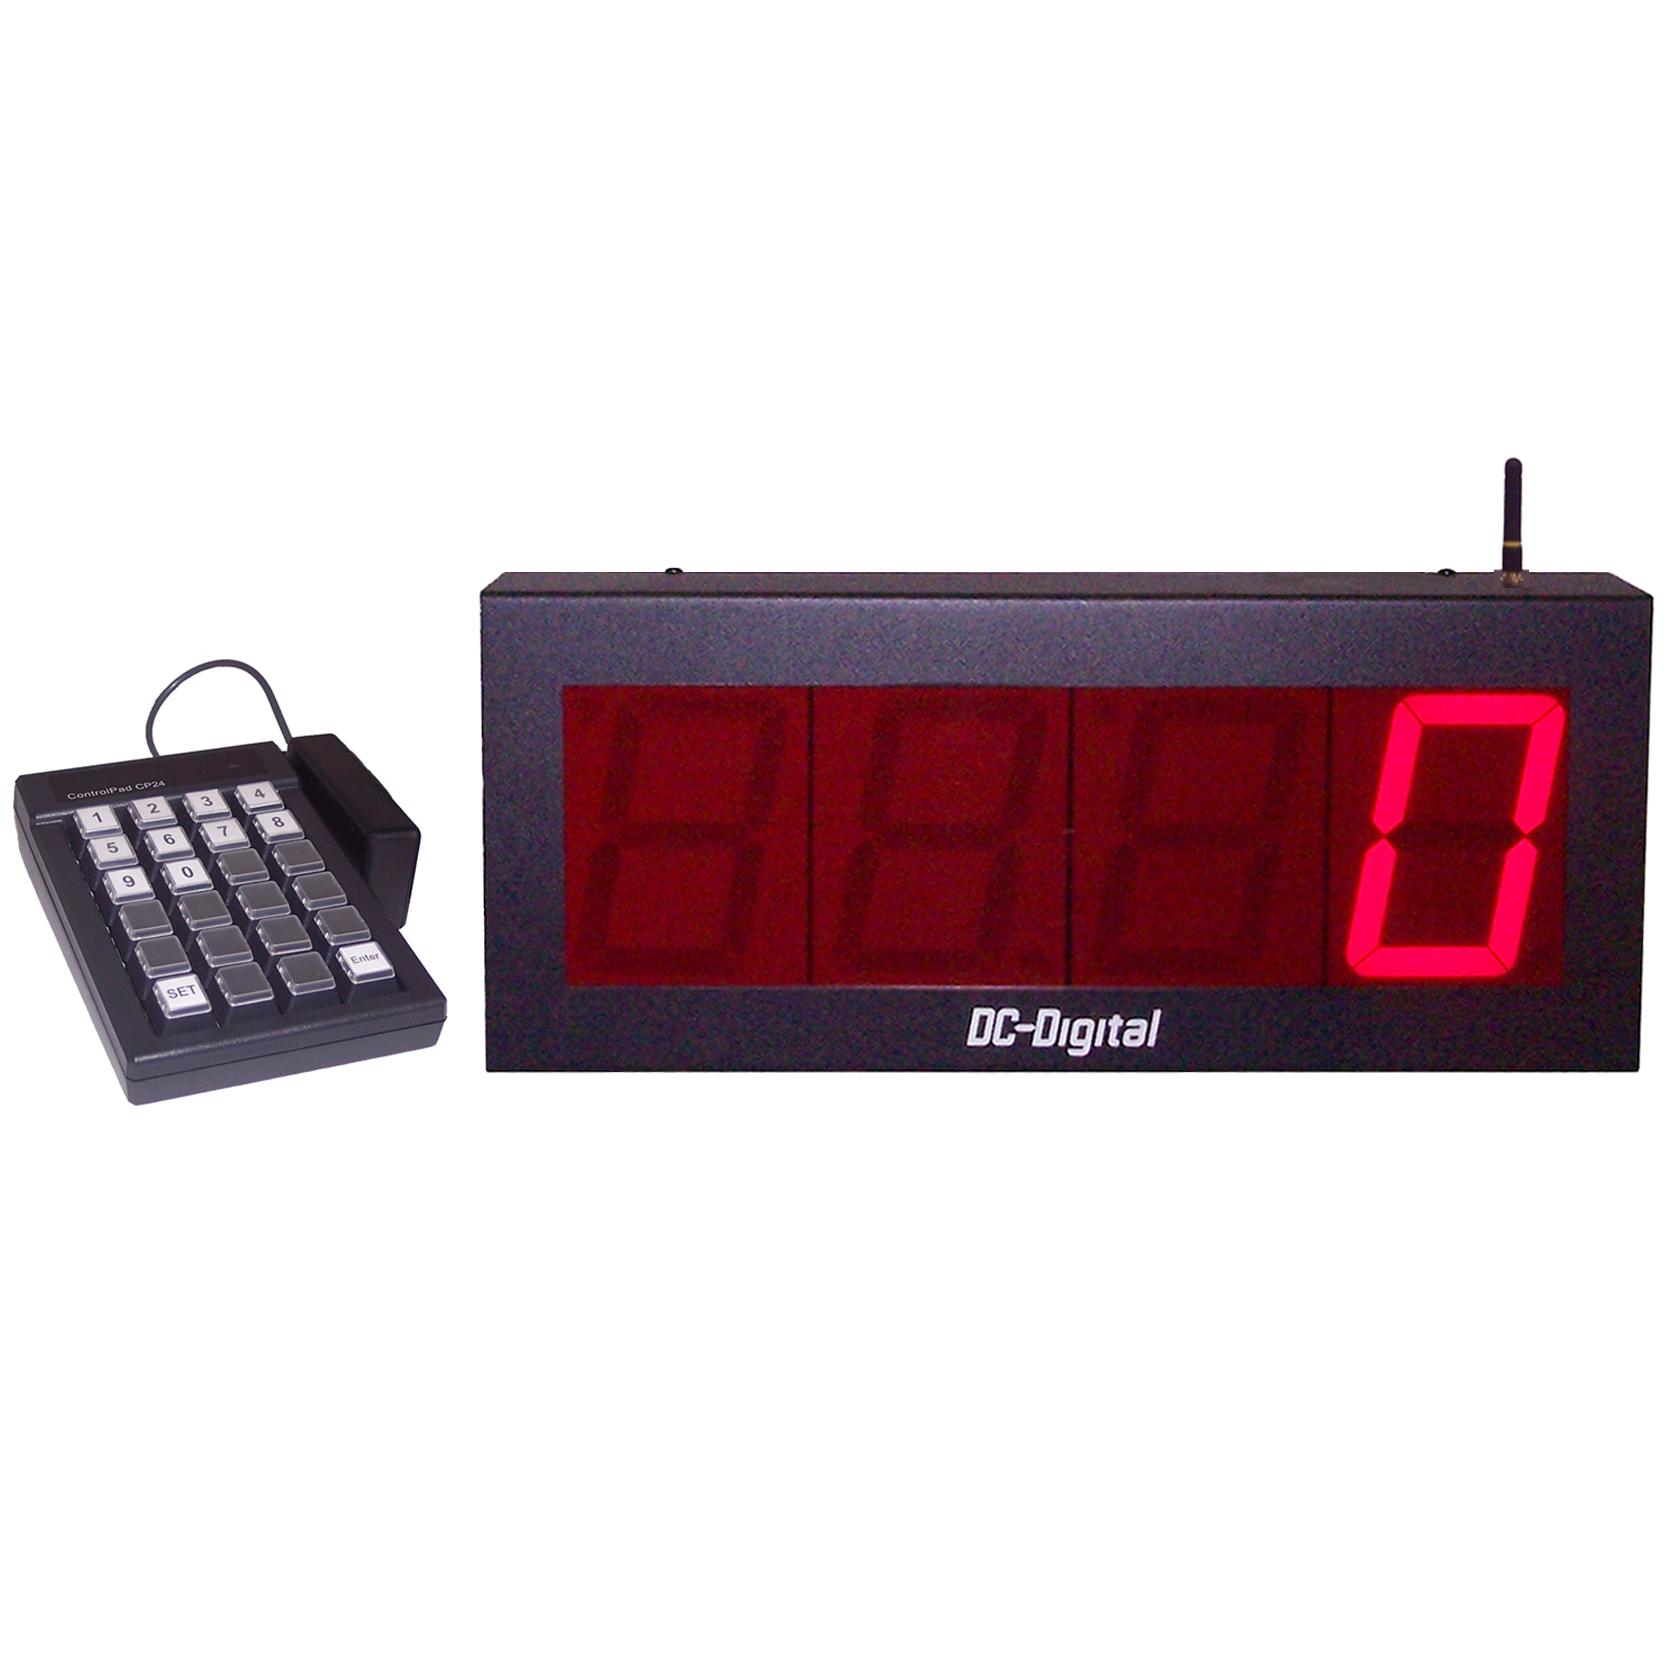 DC-40-Static-Key-W-Wireless-Keypad-Controlled-Static-Number-Display-4-inch-Digits